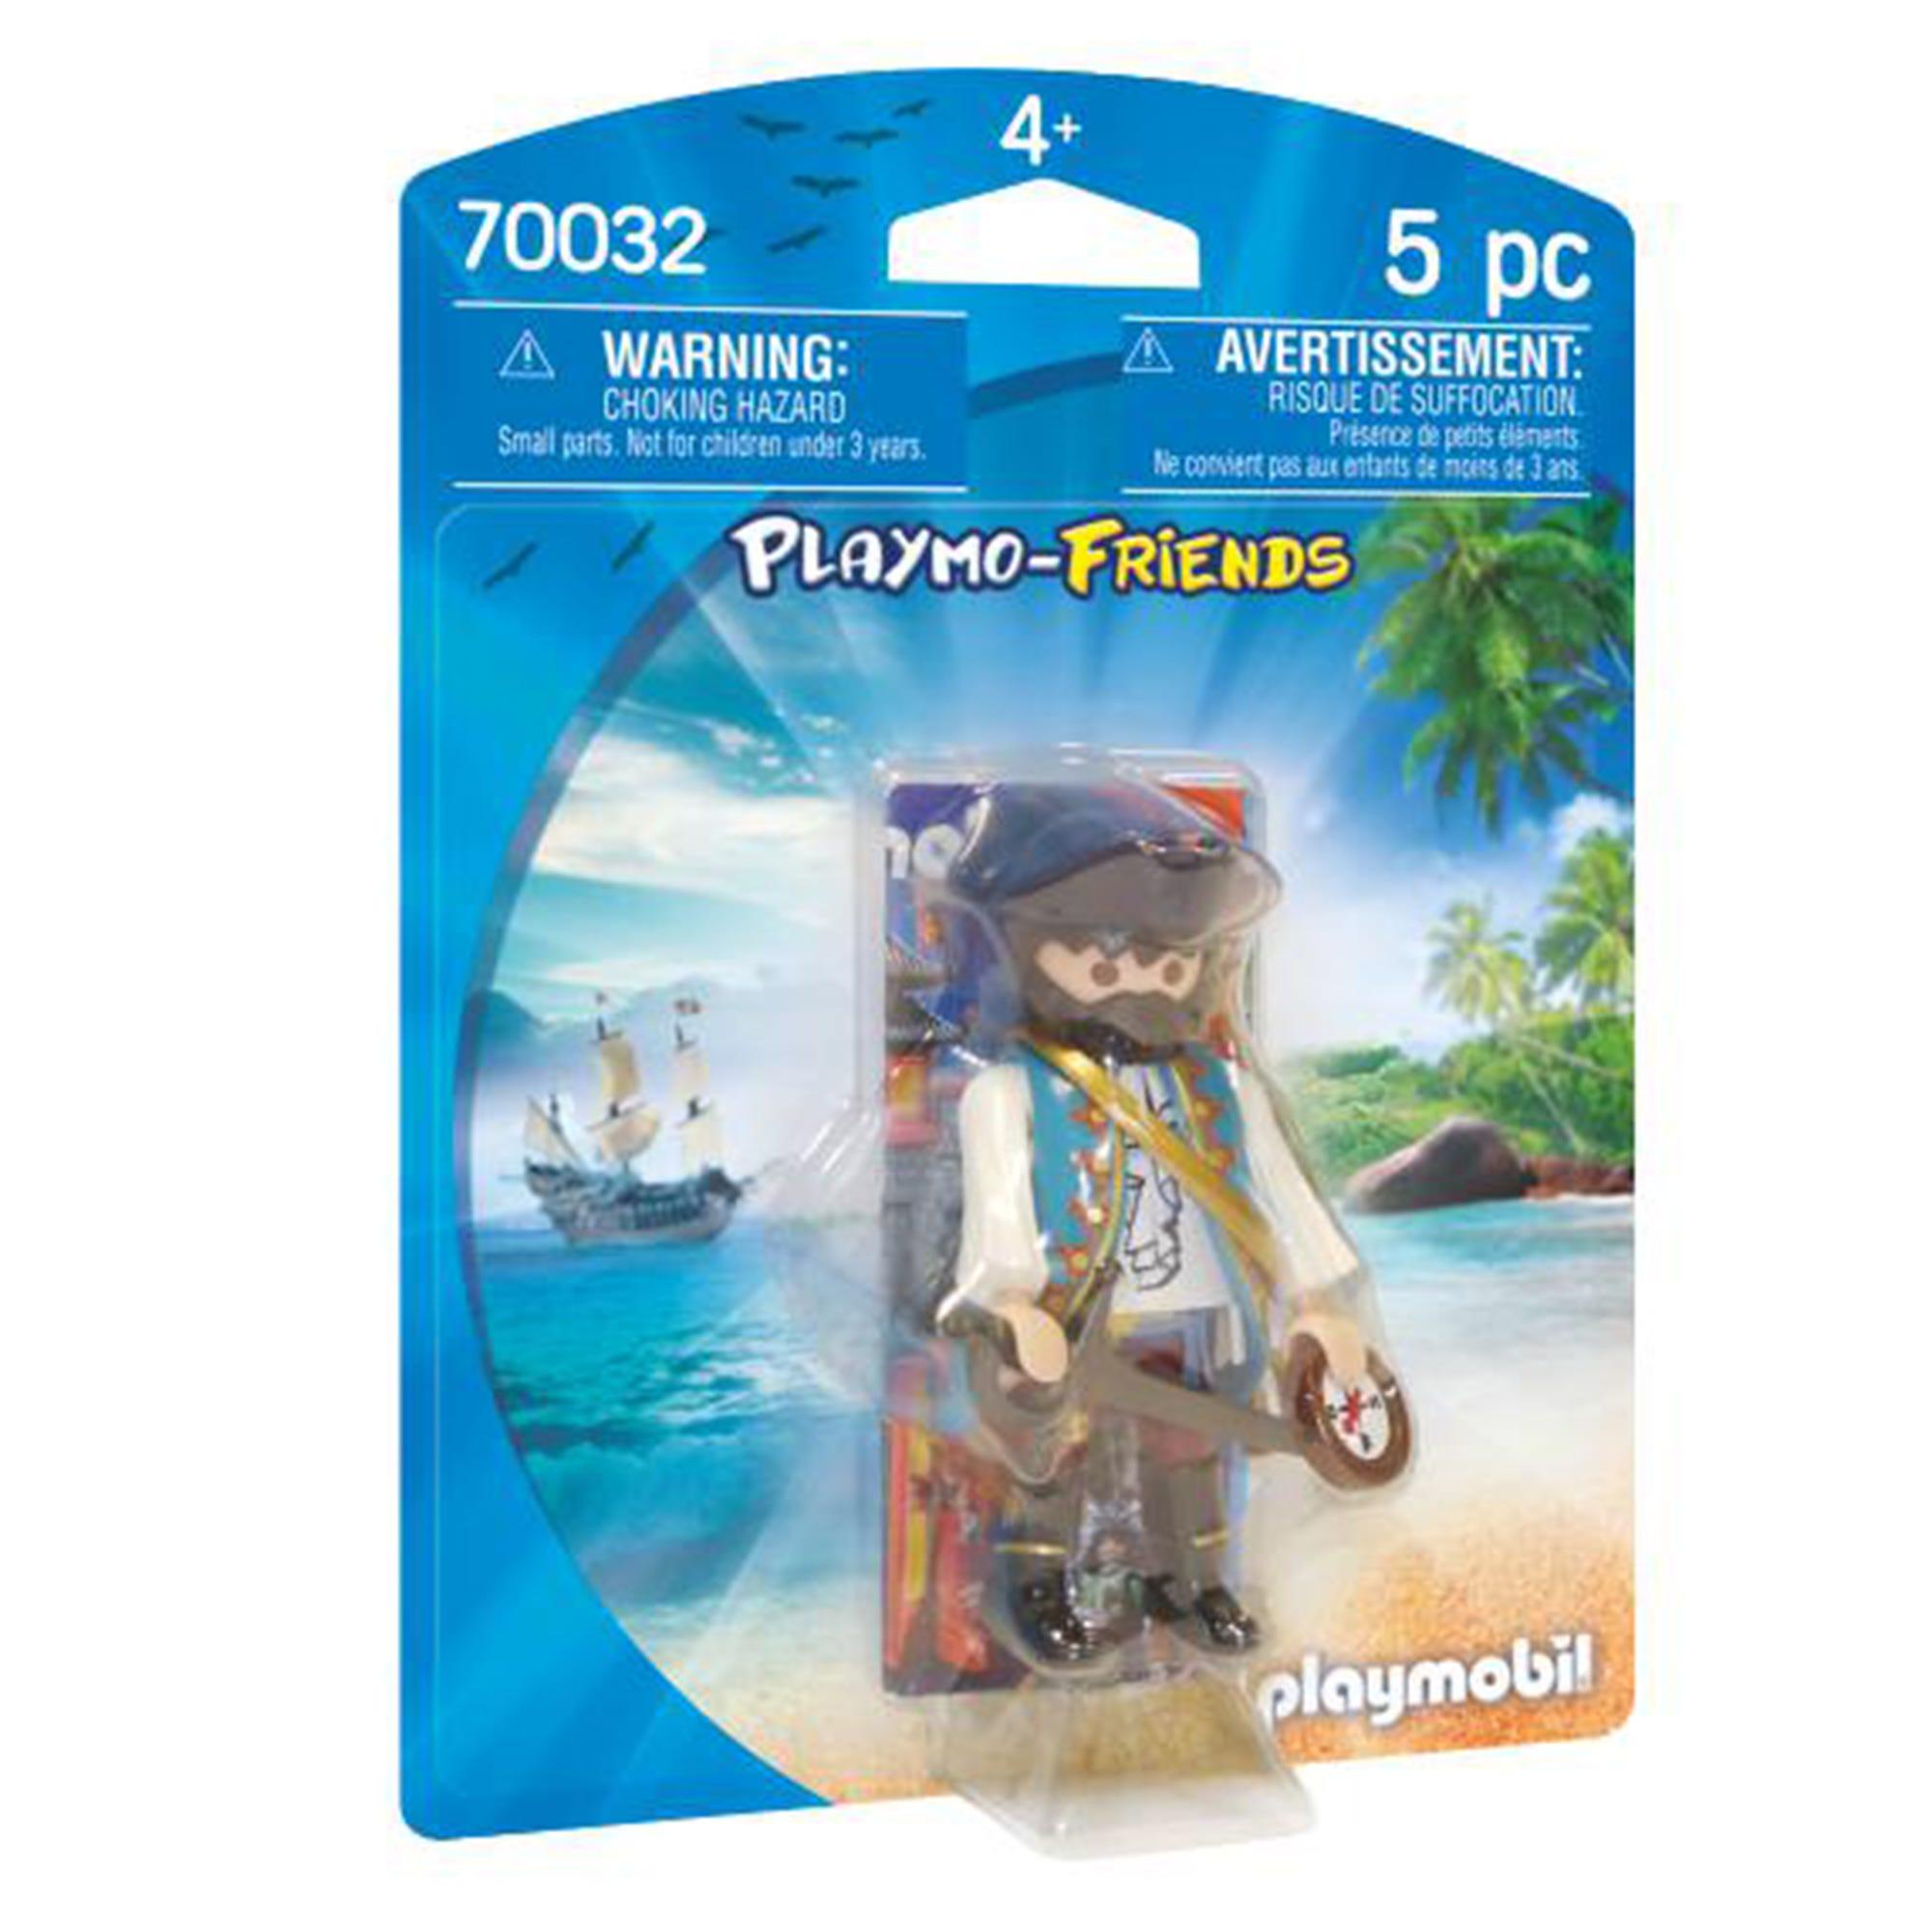 Playmobil Playmo Friends Pirate 70032